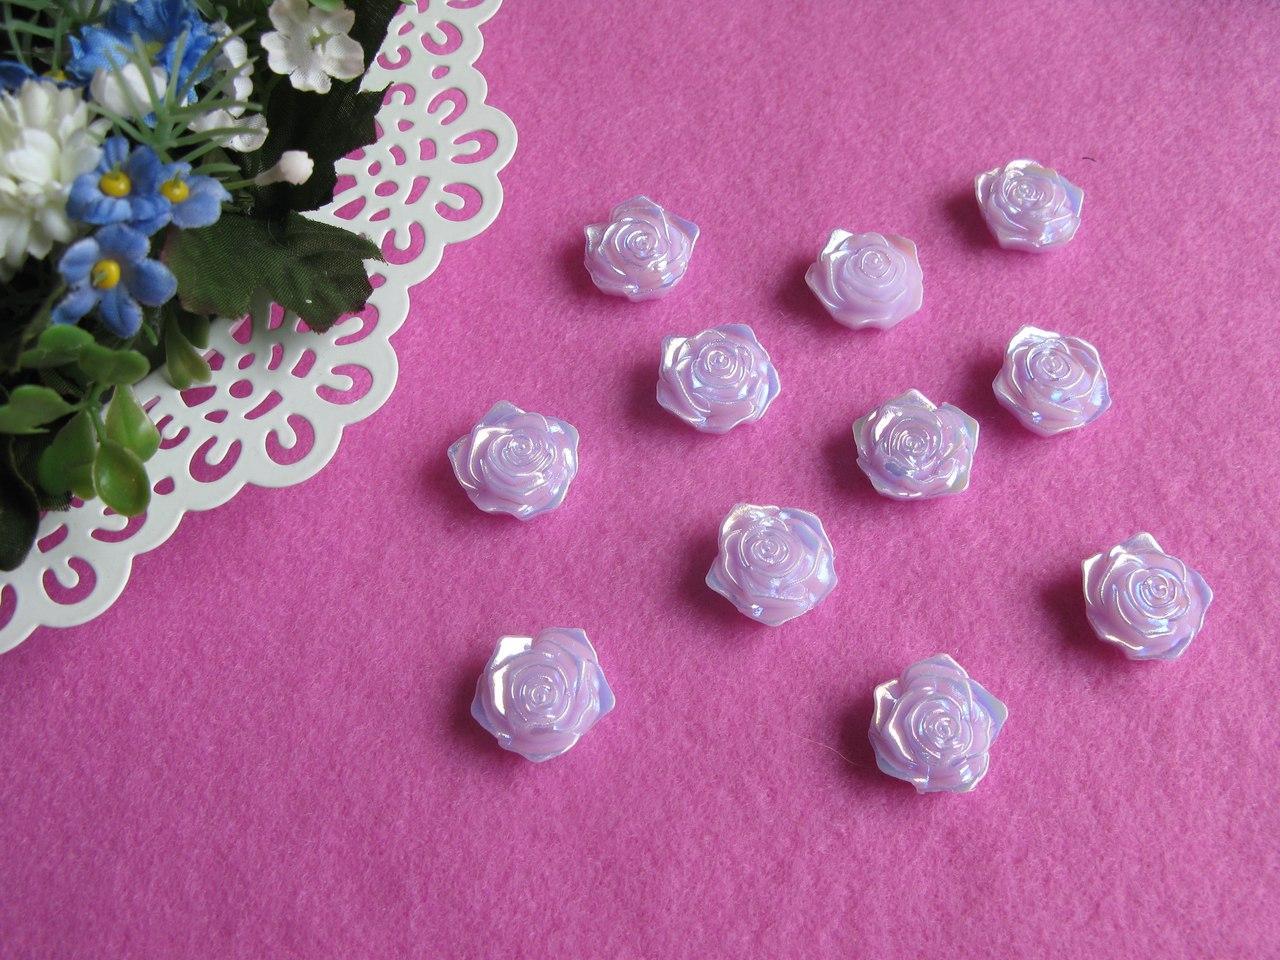 Серединка акриловая - Сиреневая роза с перламутром  р-р -19 мм цена 2 грн - 1 шт